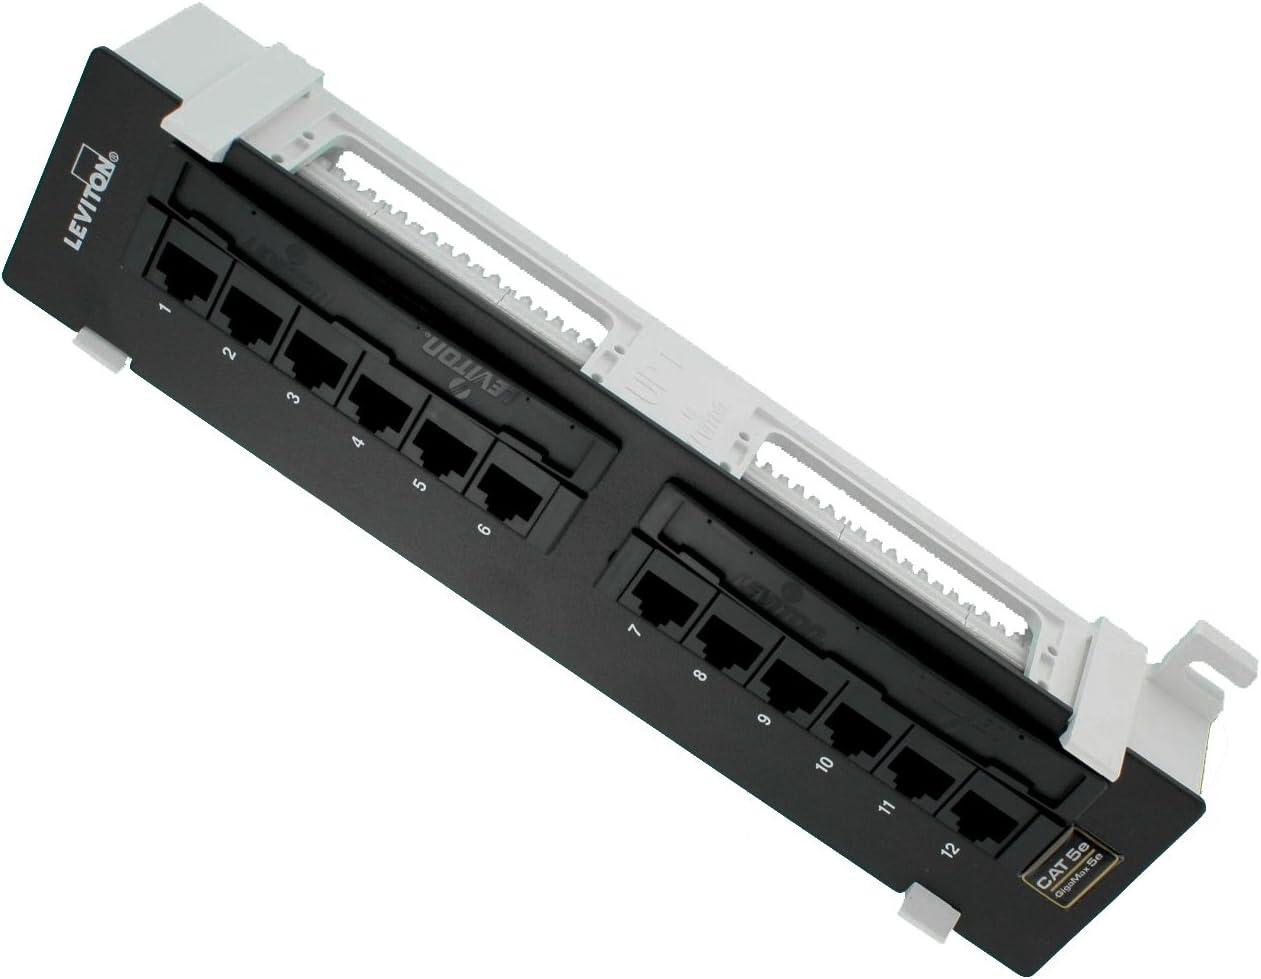 Cat 5E 10.0-inchH X 2.3-inchW Leviton 5G596-U89 GigaMax 5E Universal 12-Port Patch Block